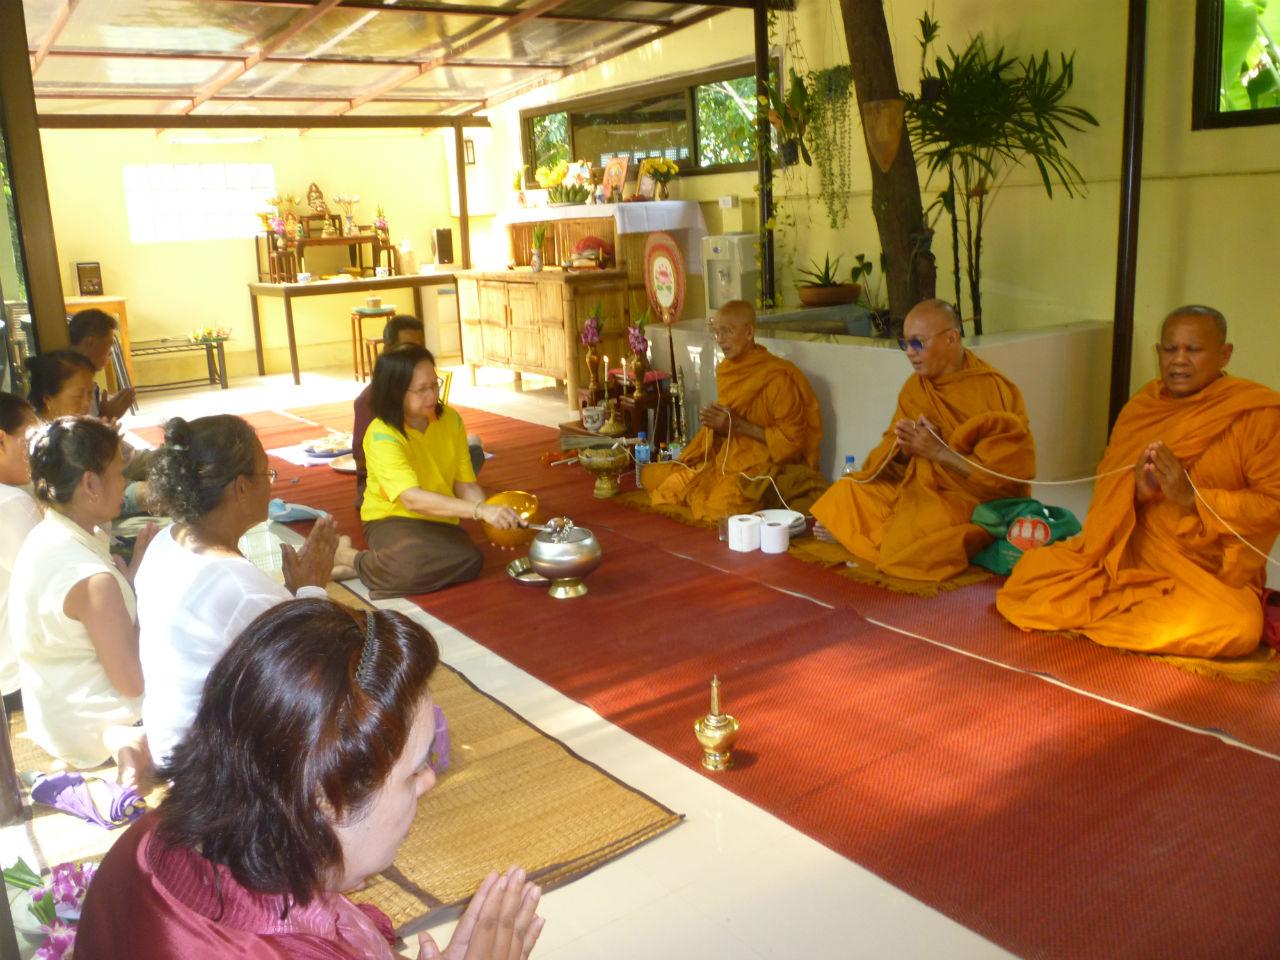 9 Incredible Health And Wellness Retreats In Thailand Matador Network